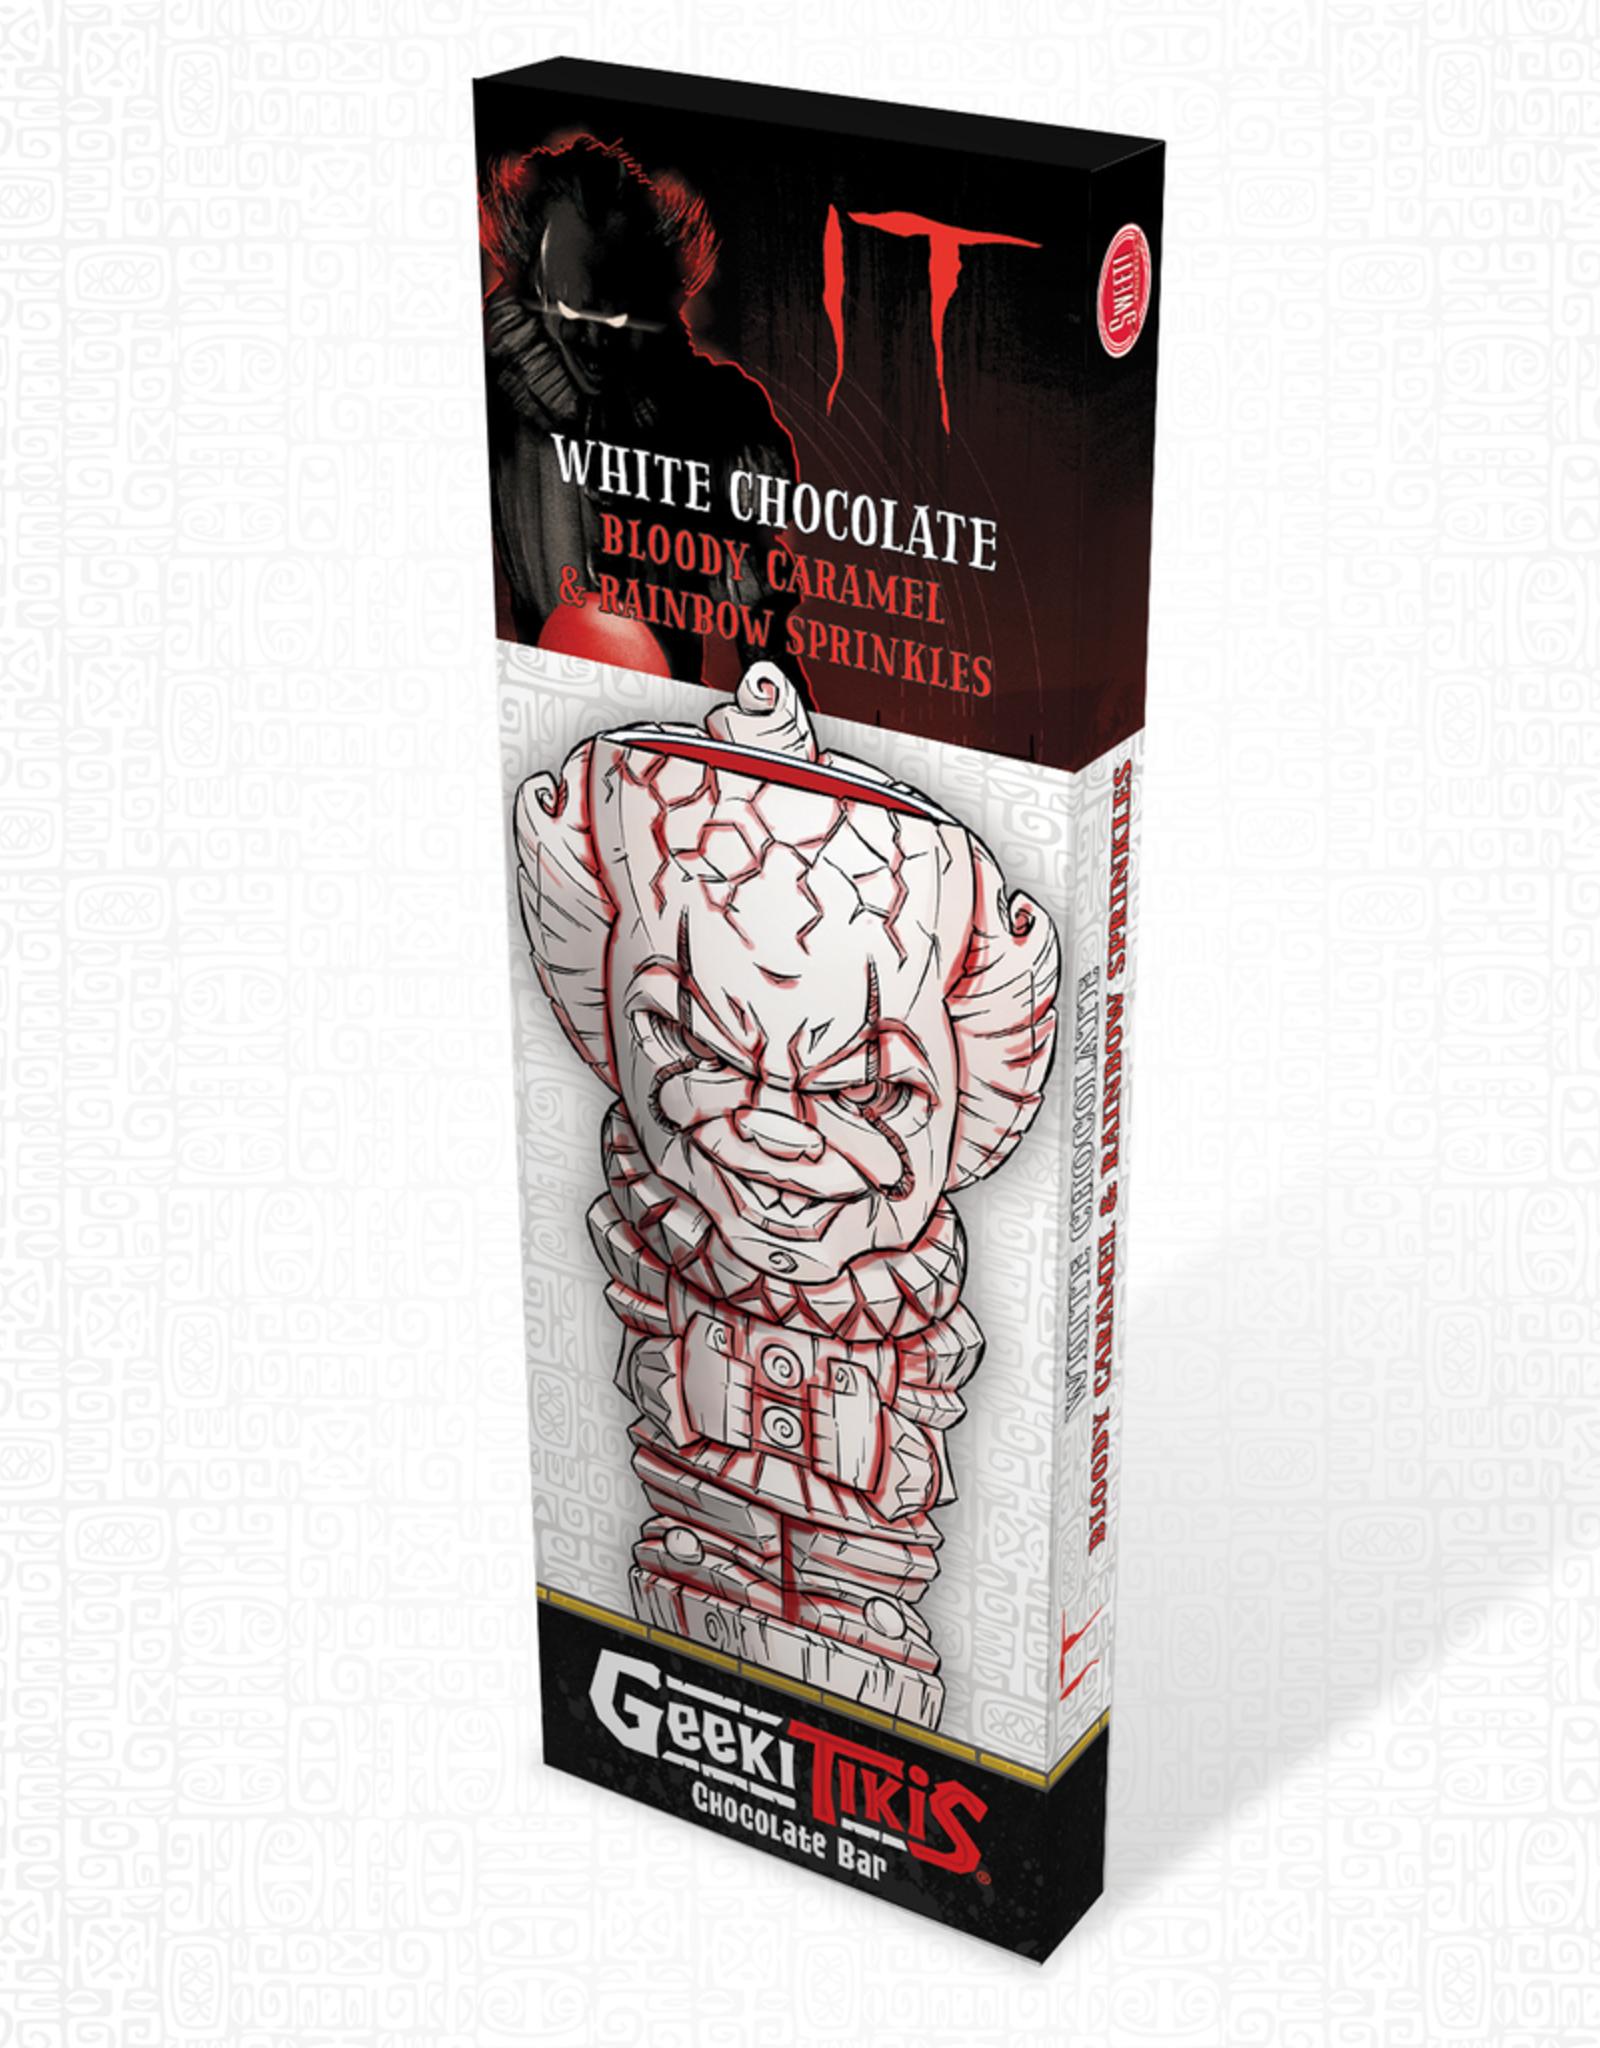 Warner Bros Geeki Tikis It Pennywise - It Chocolate Bar White Chocolate, Bloody Caramel & Rainbow Sprinkles